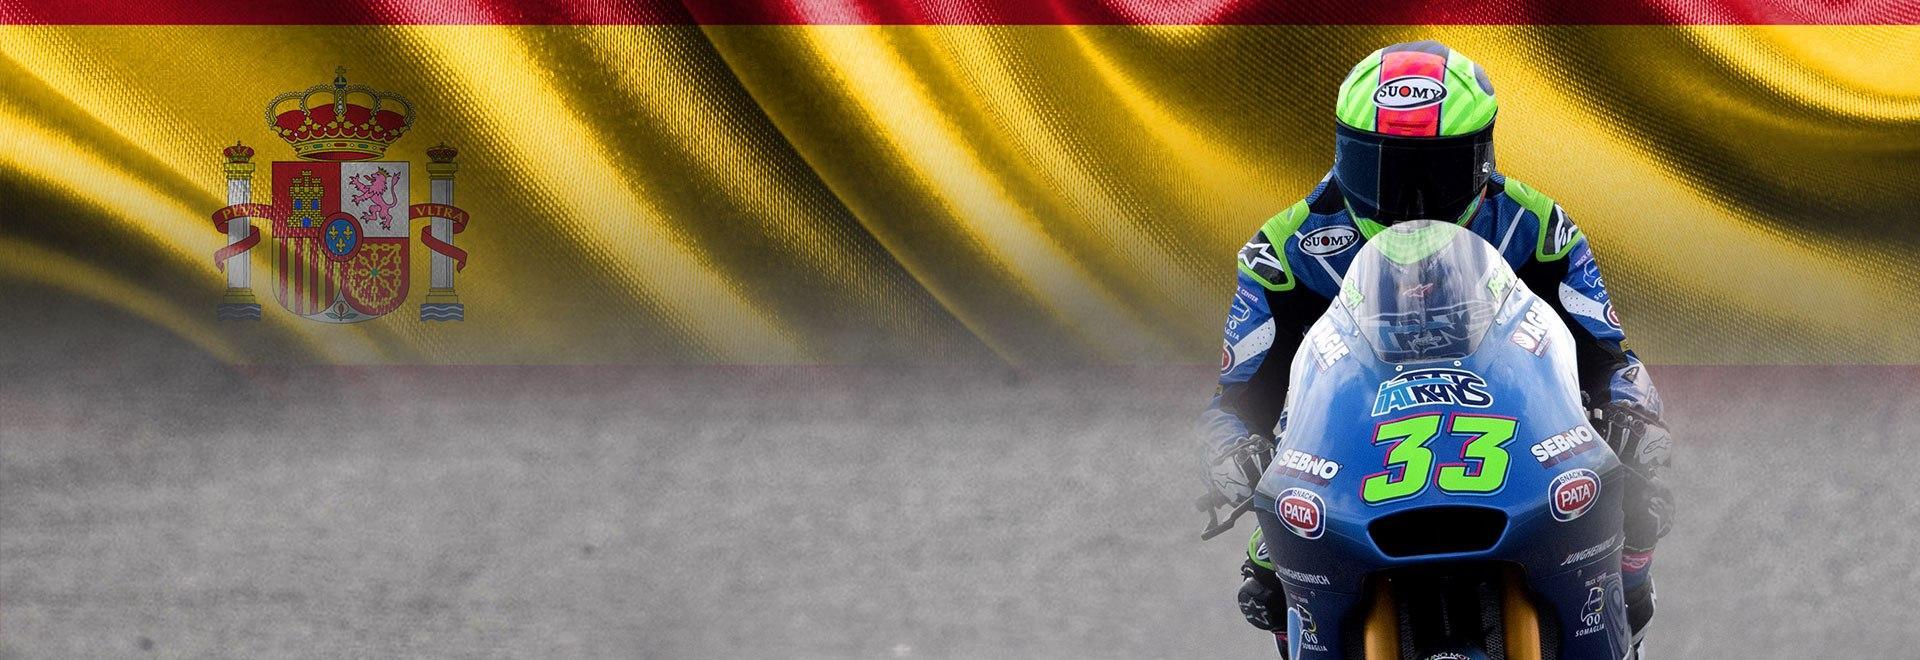 GP Spagna. PL3